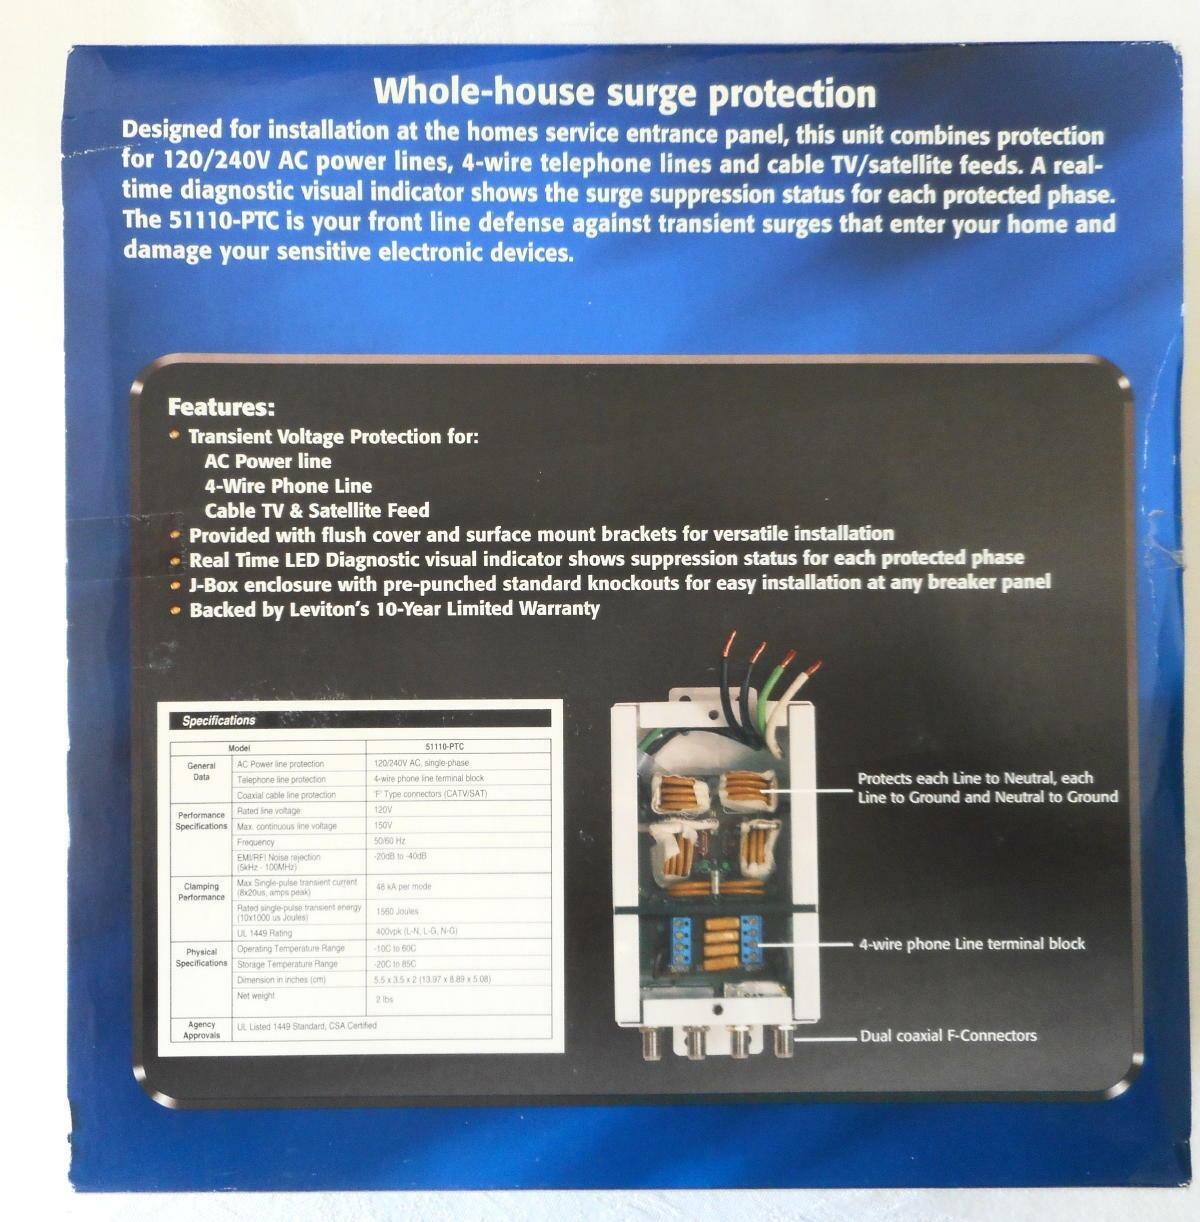 GY_1729] Leviton Photoelectric Switch Wiring Diagram Schematic WiringUmng Emba Cran Xolia Shopa Mohammedshrine Librar Wiring 101